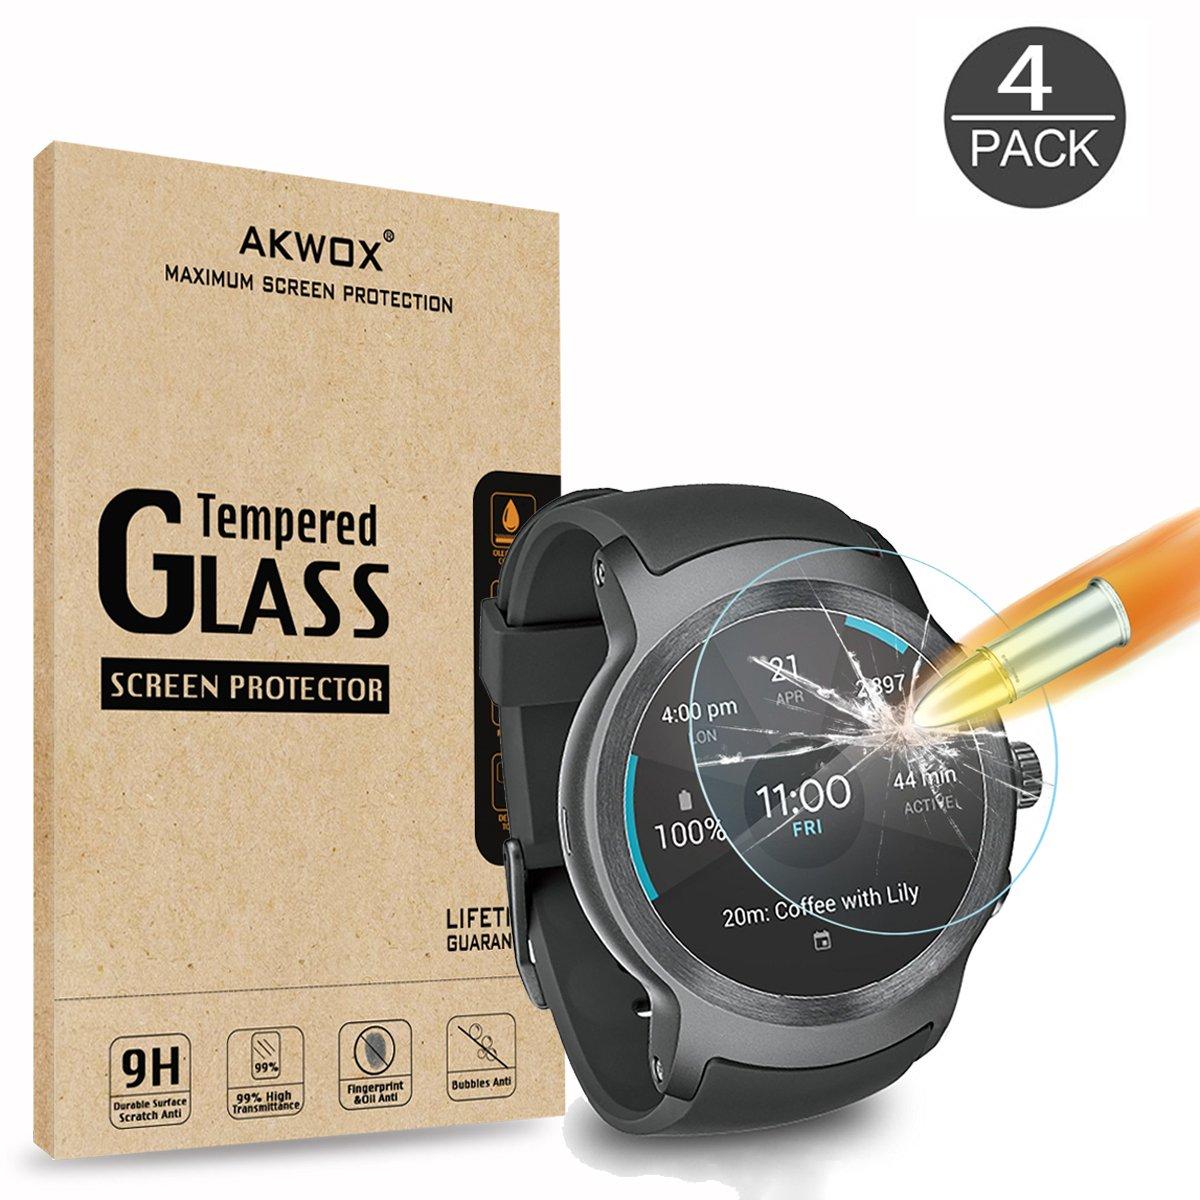 Vidrio Protector para Lg Watch Sport x4 AKWOX -78SQ5V87